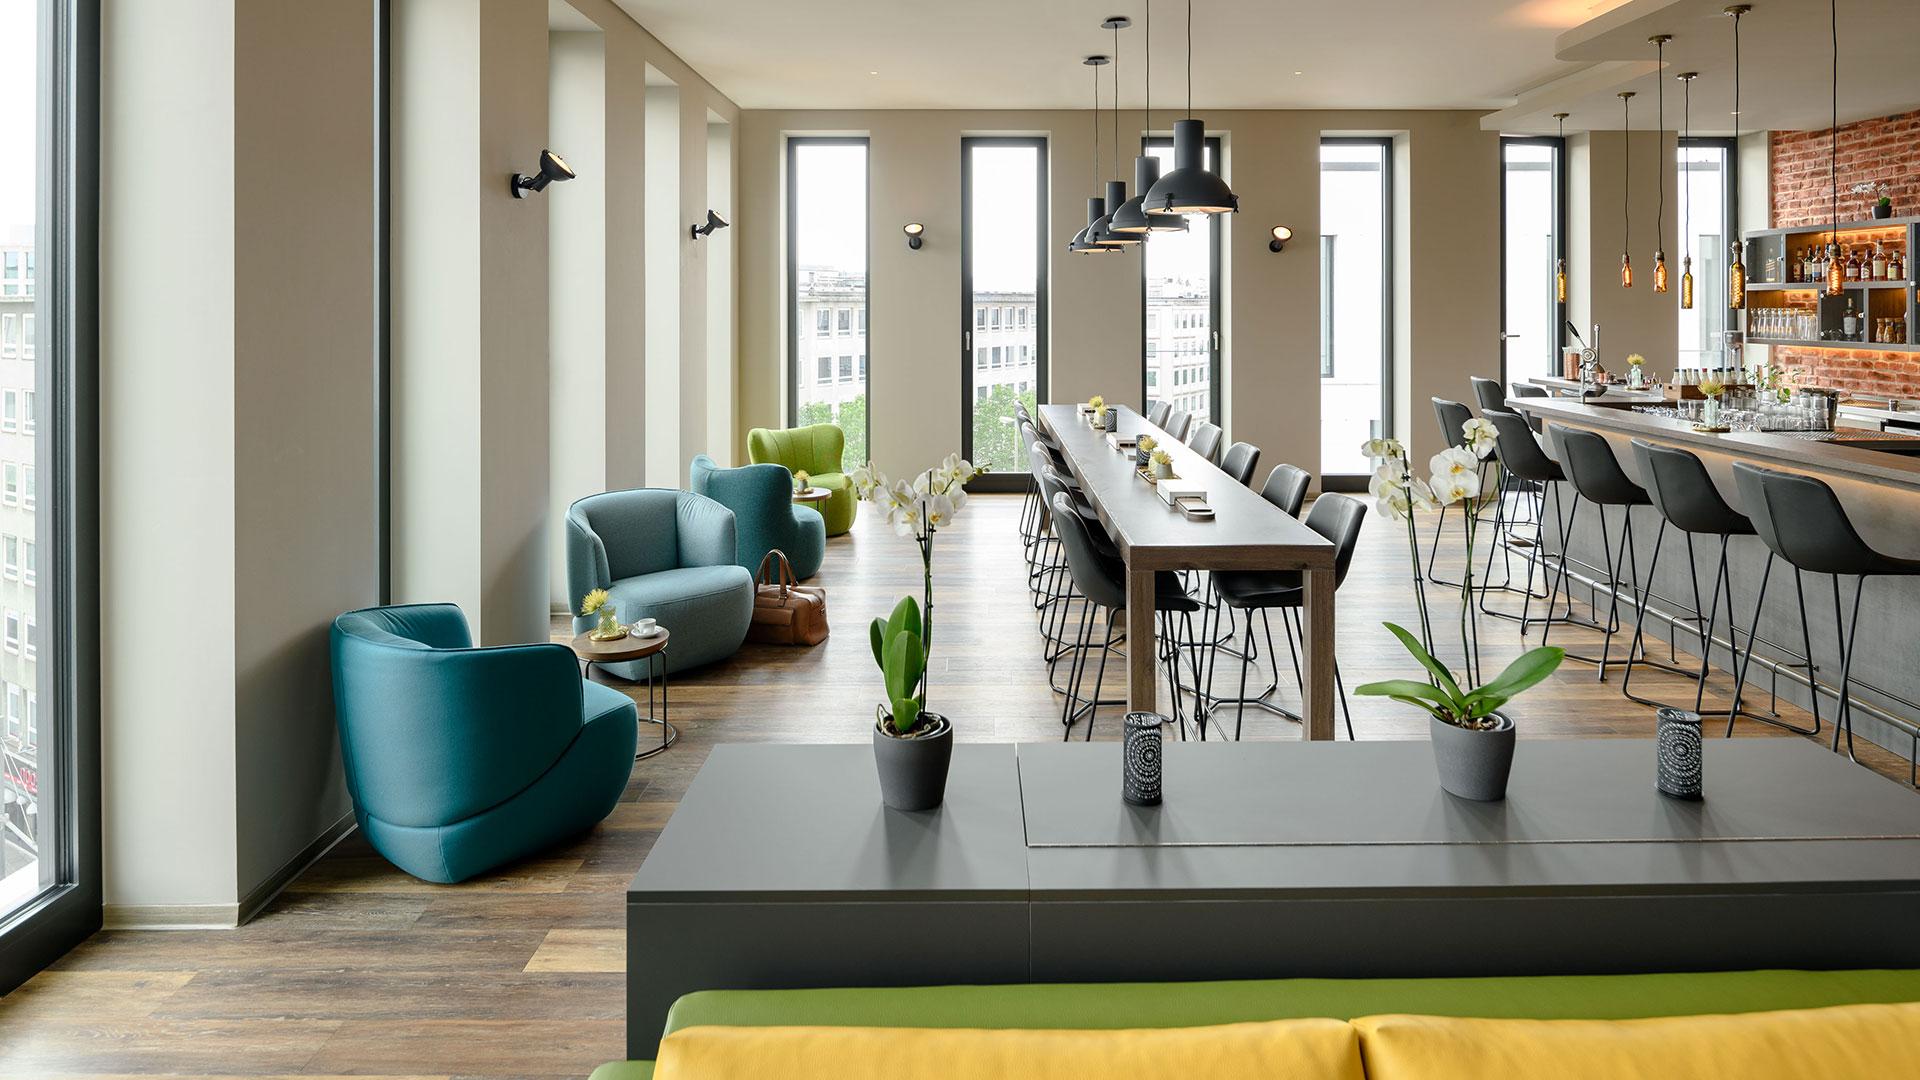 Foto der Lounge - 03 - Aparthotel Adagio Bremen